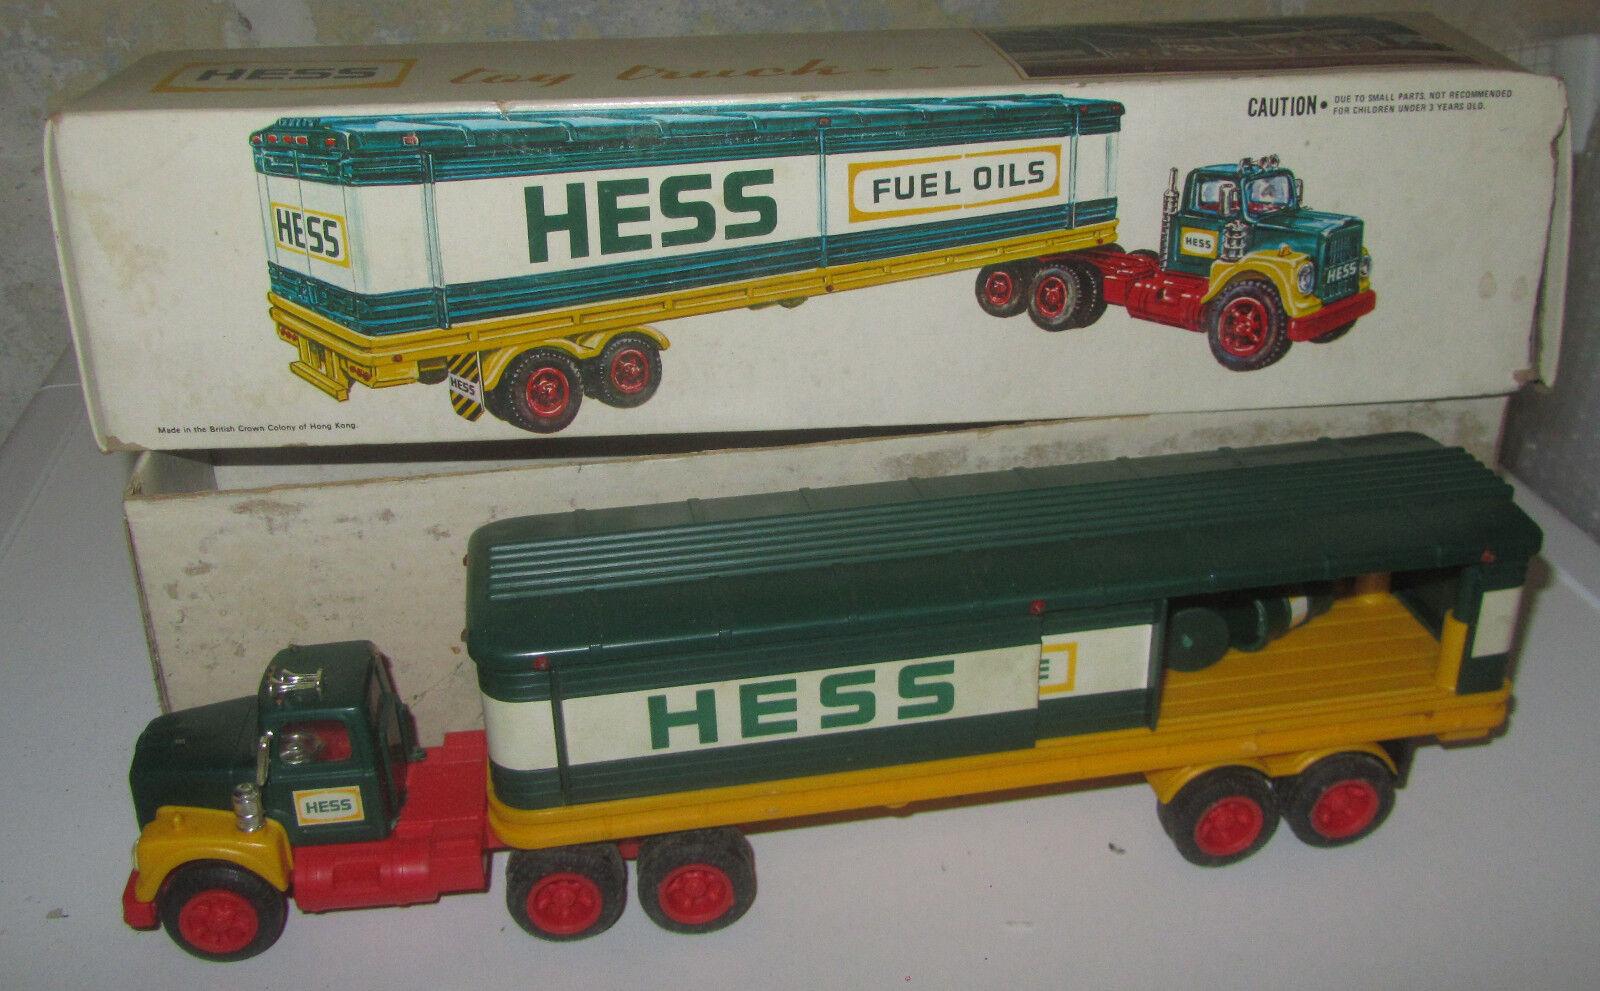 Camion Cisterna AMERADA HESS TOY TRUCK TANKER FUEL OILS Vintage